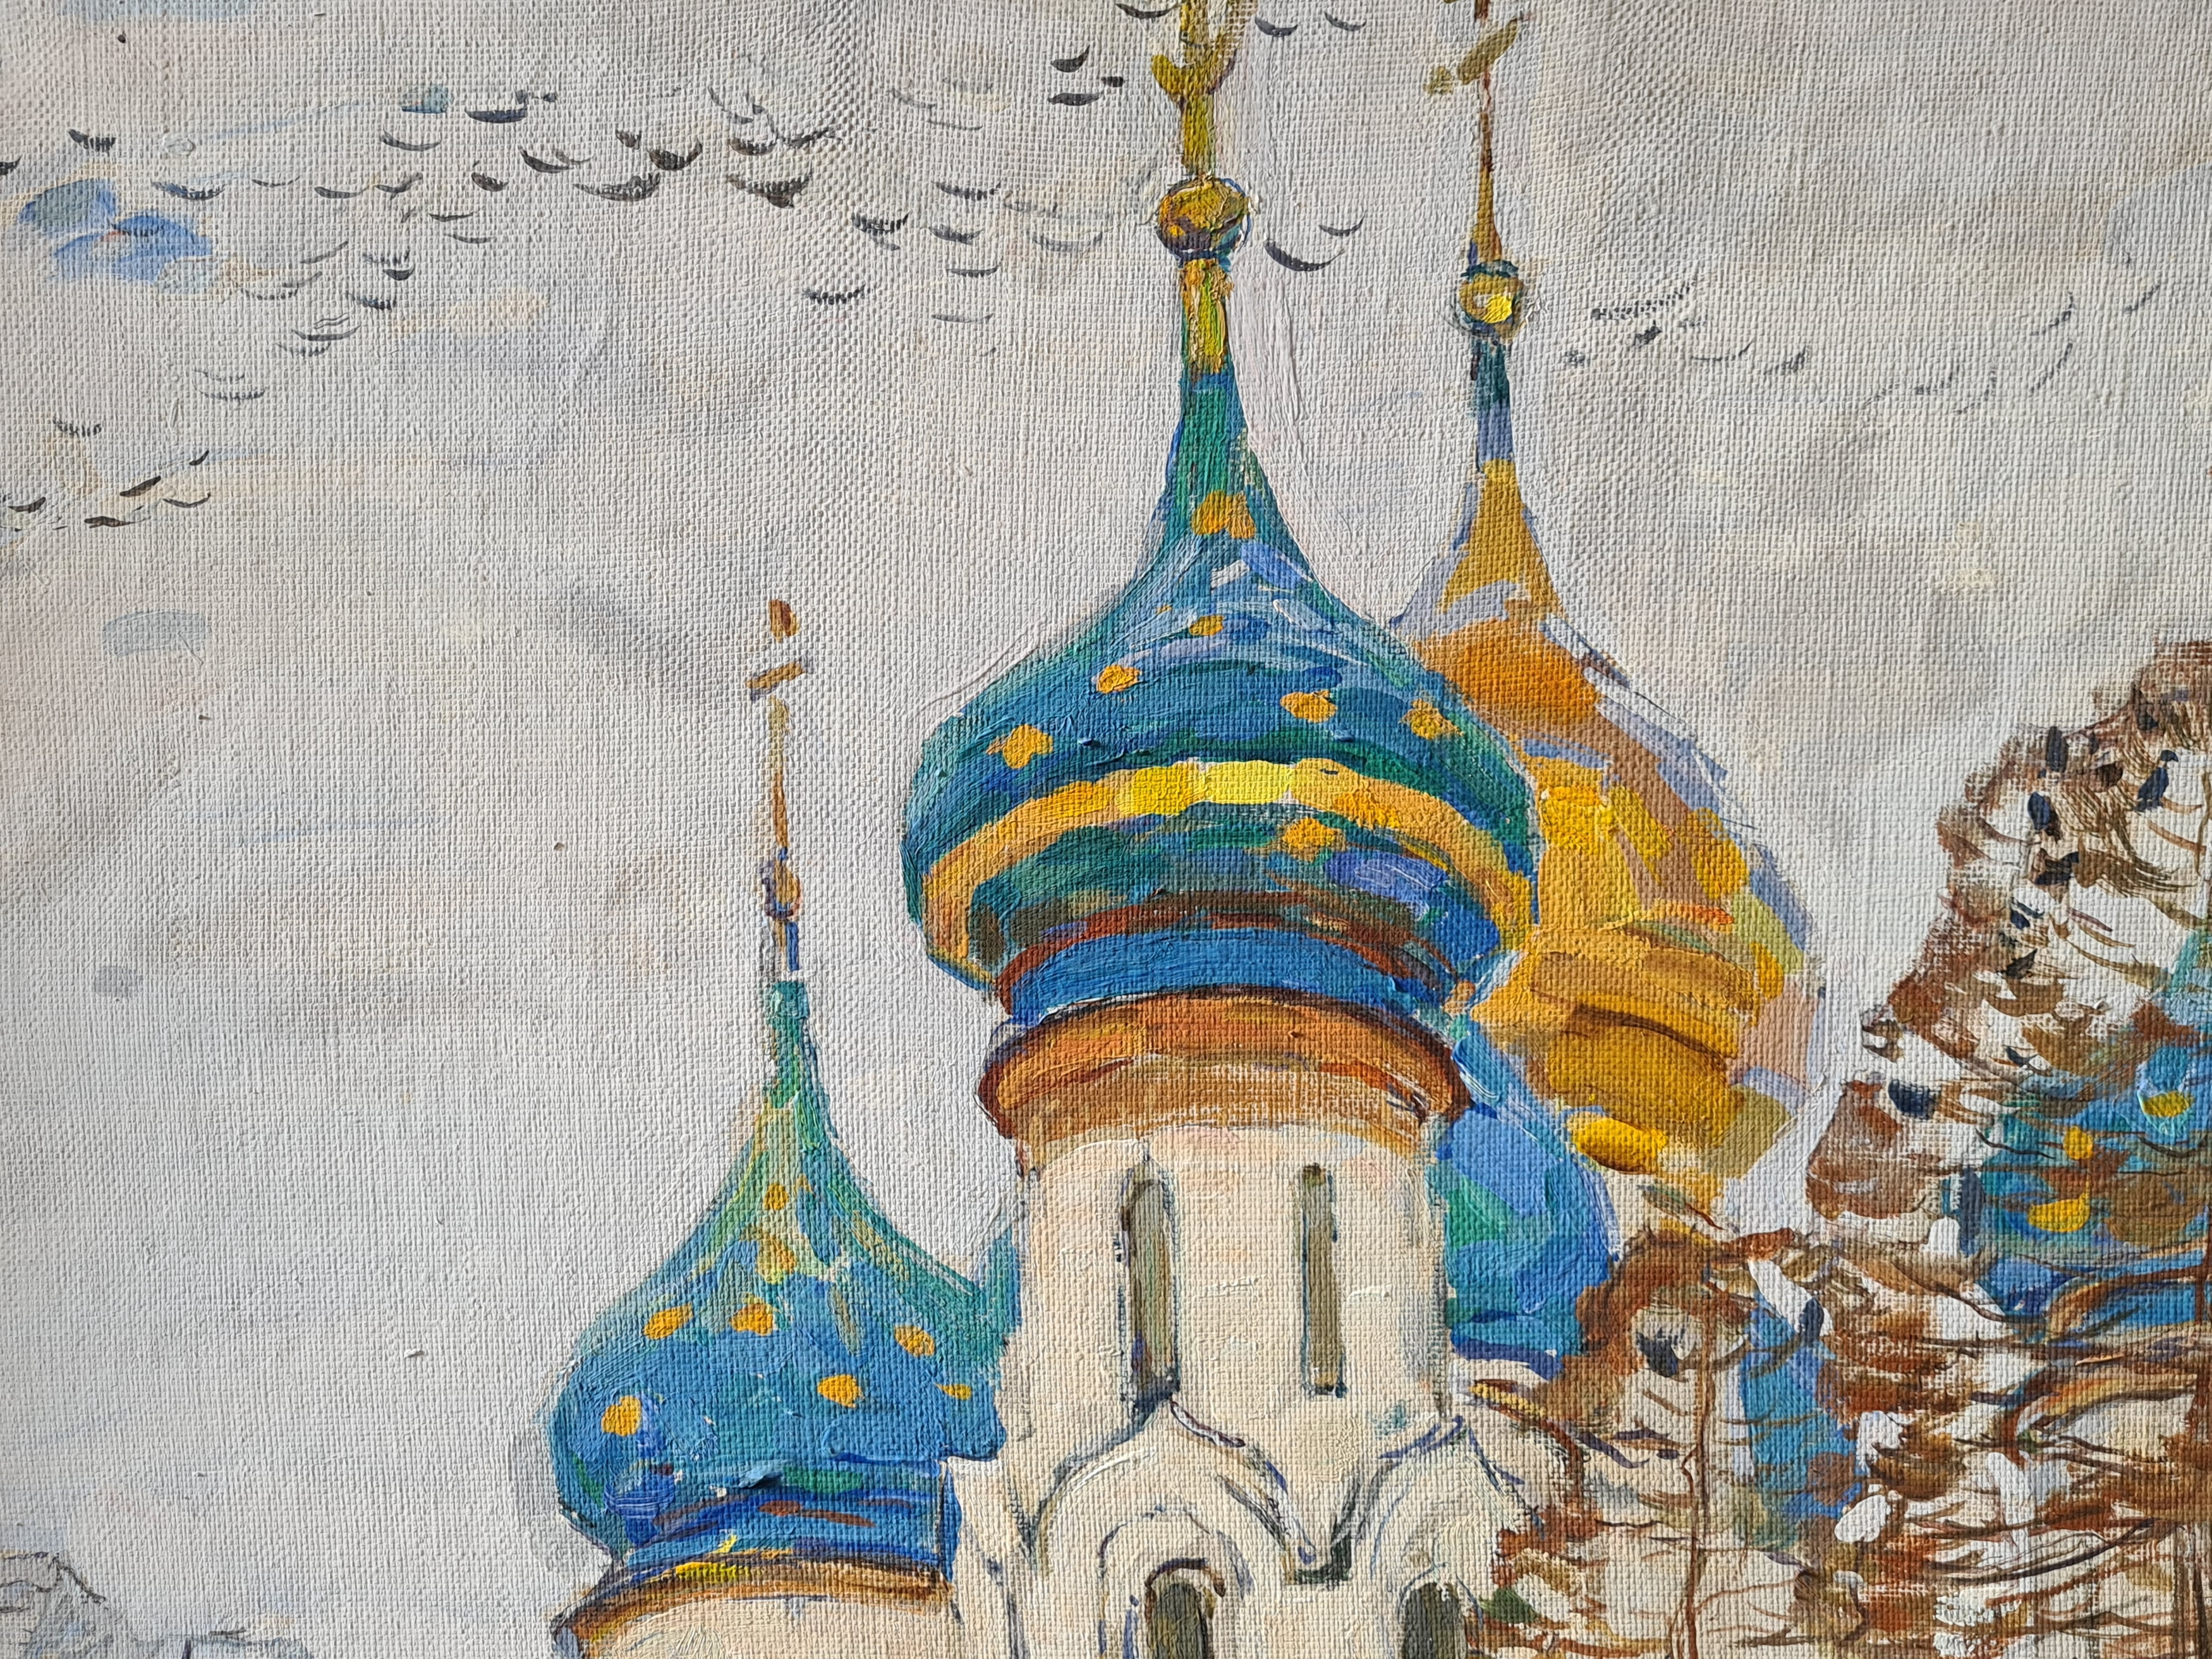 Vassili Paramonov (Russian 1923-2006) - Image 6 of 6